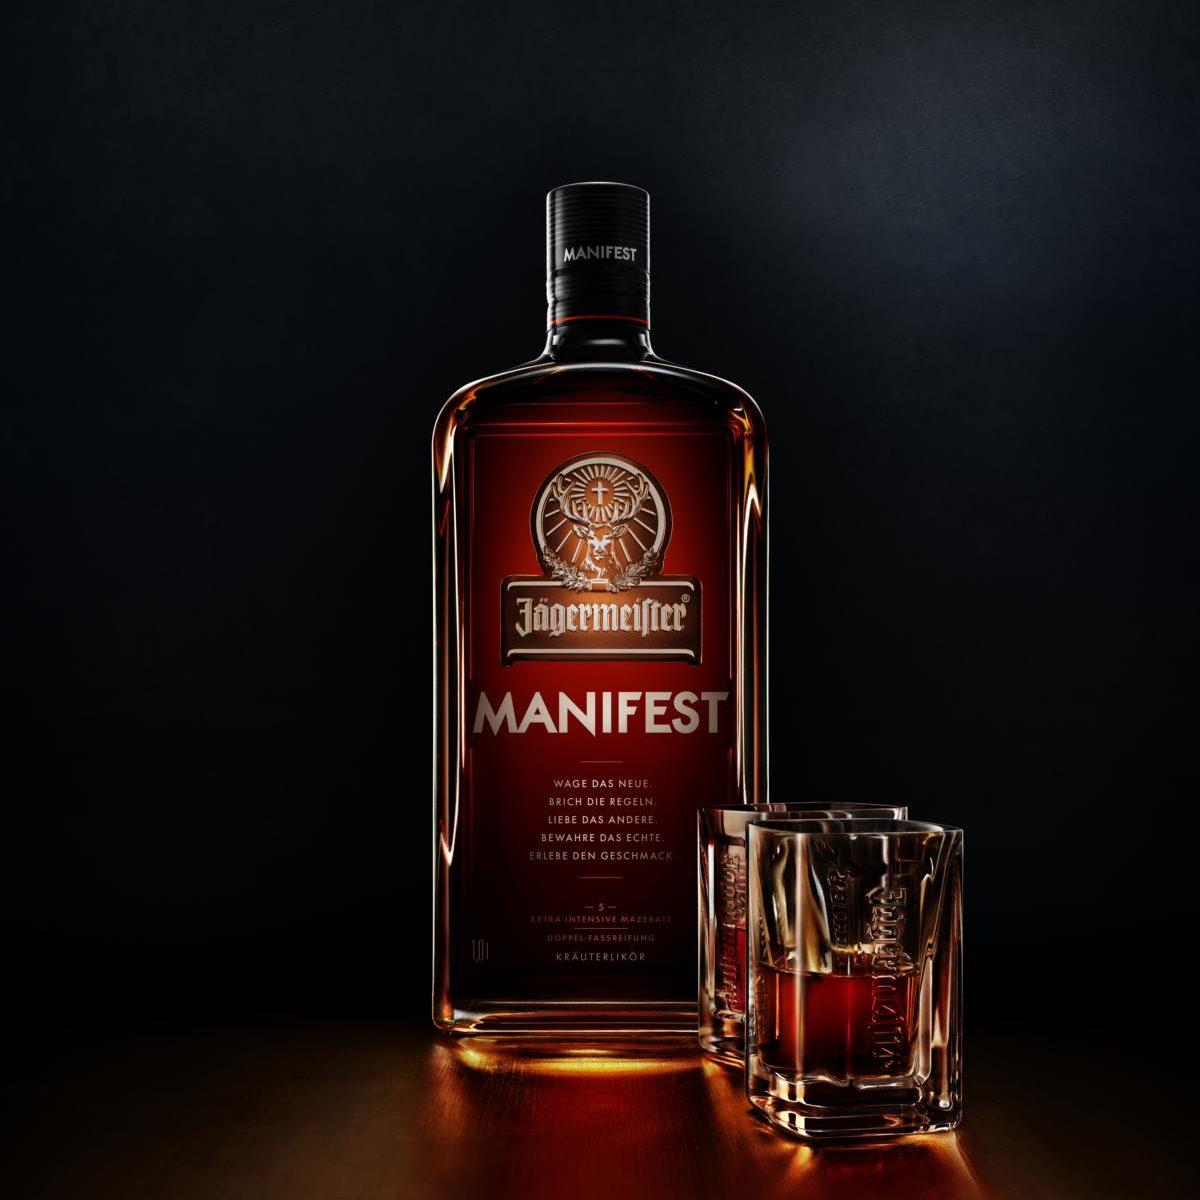 Jägermeister Manifest Kaufen